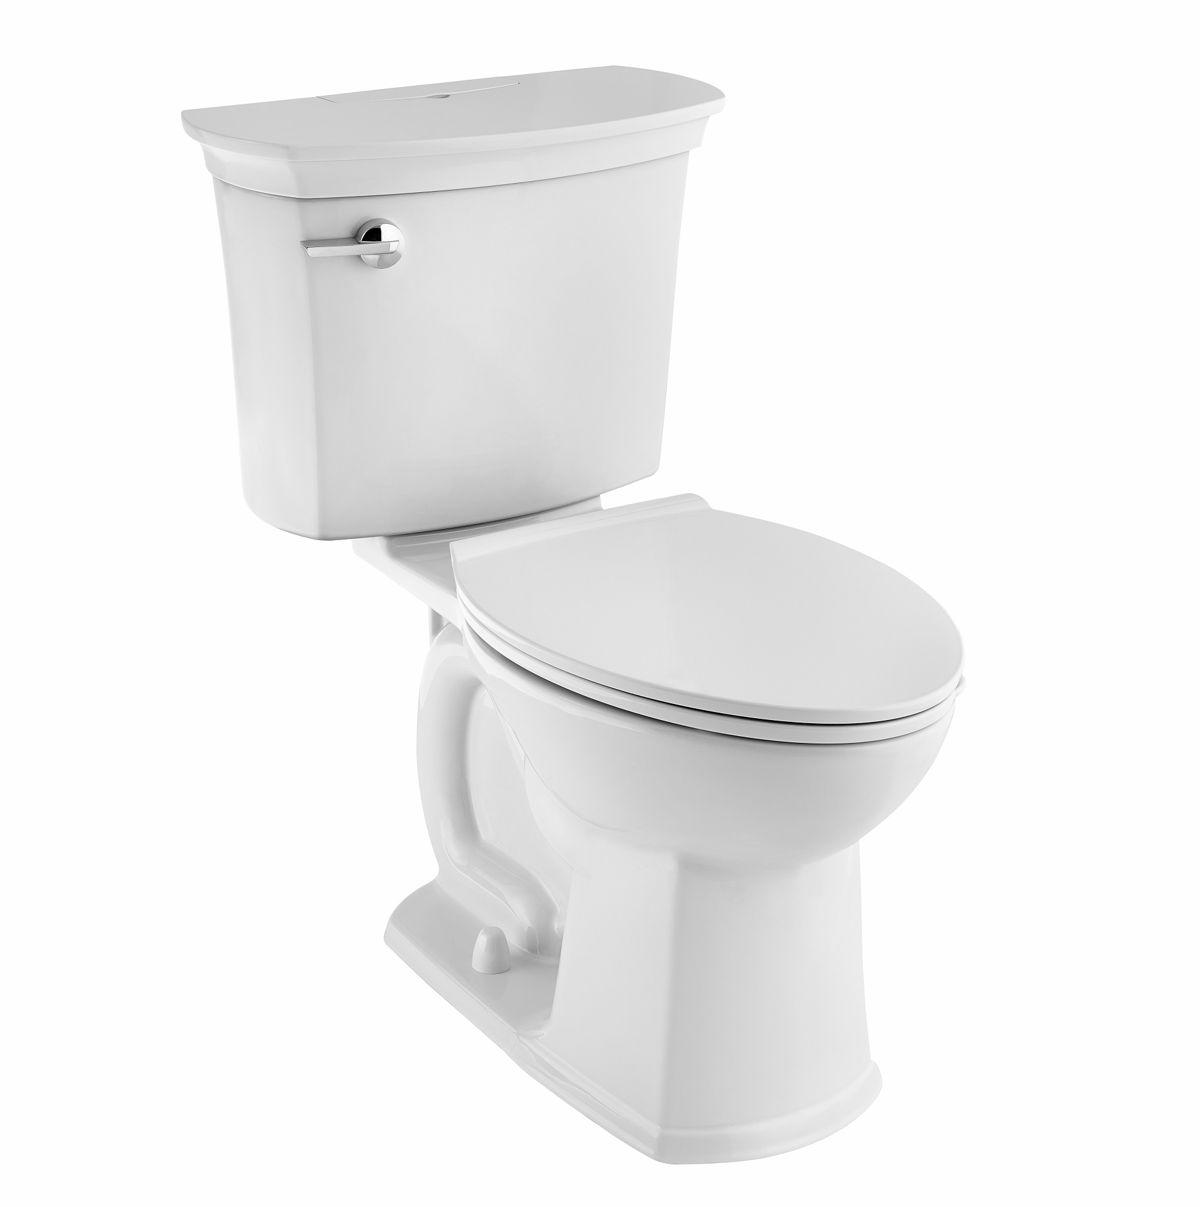 American Standard ActiClean toilet. Photo courtesy of American Standard at Ferguson Bath, Kitchen & Lighting Gallery.